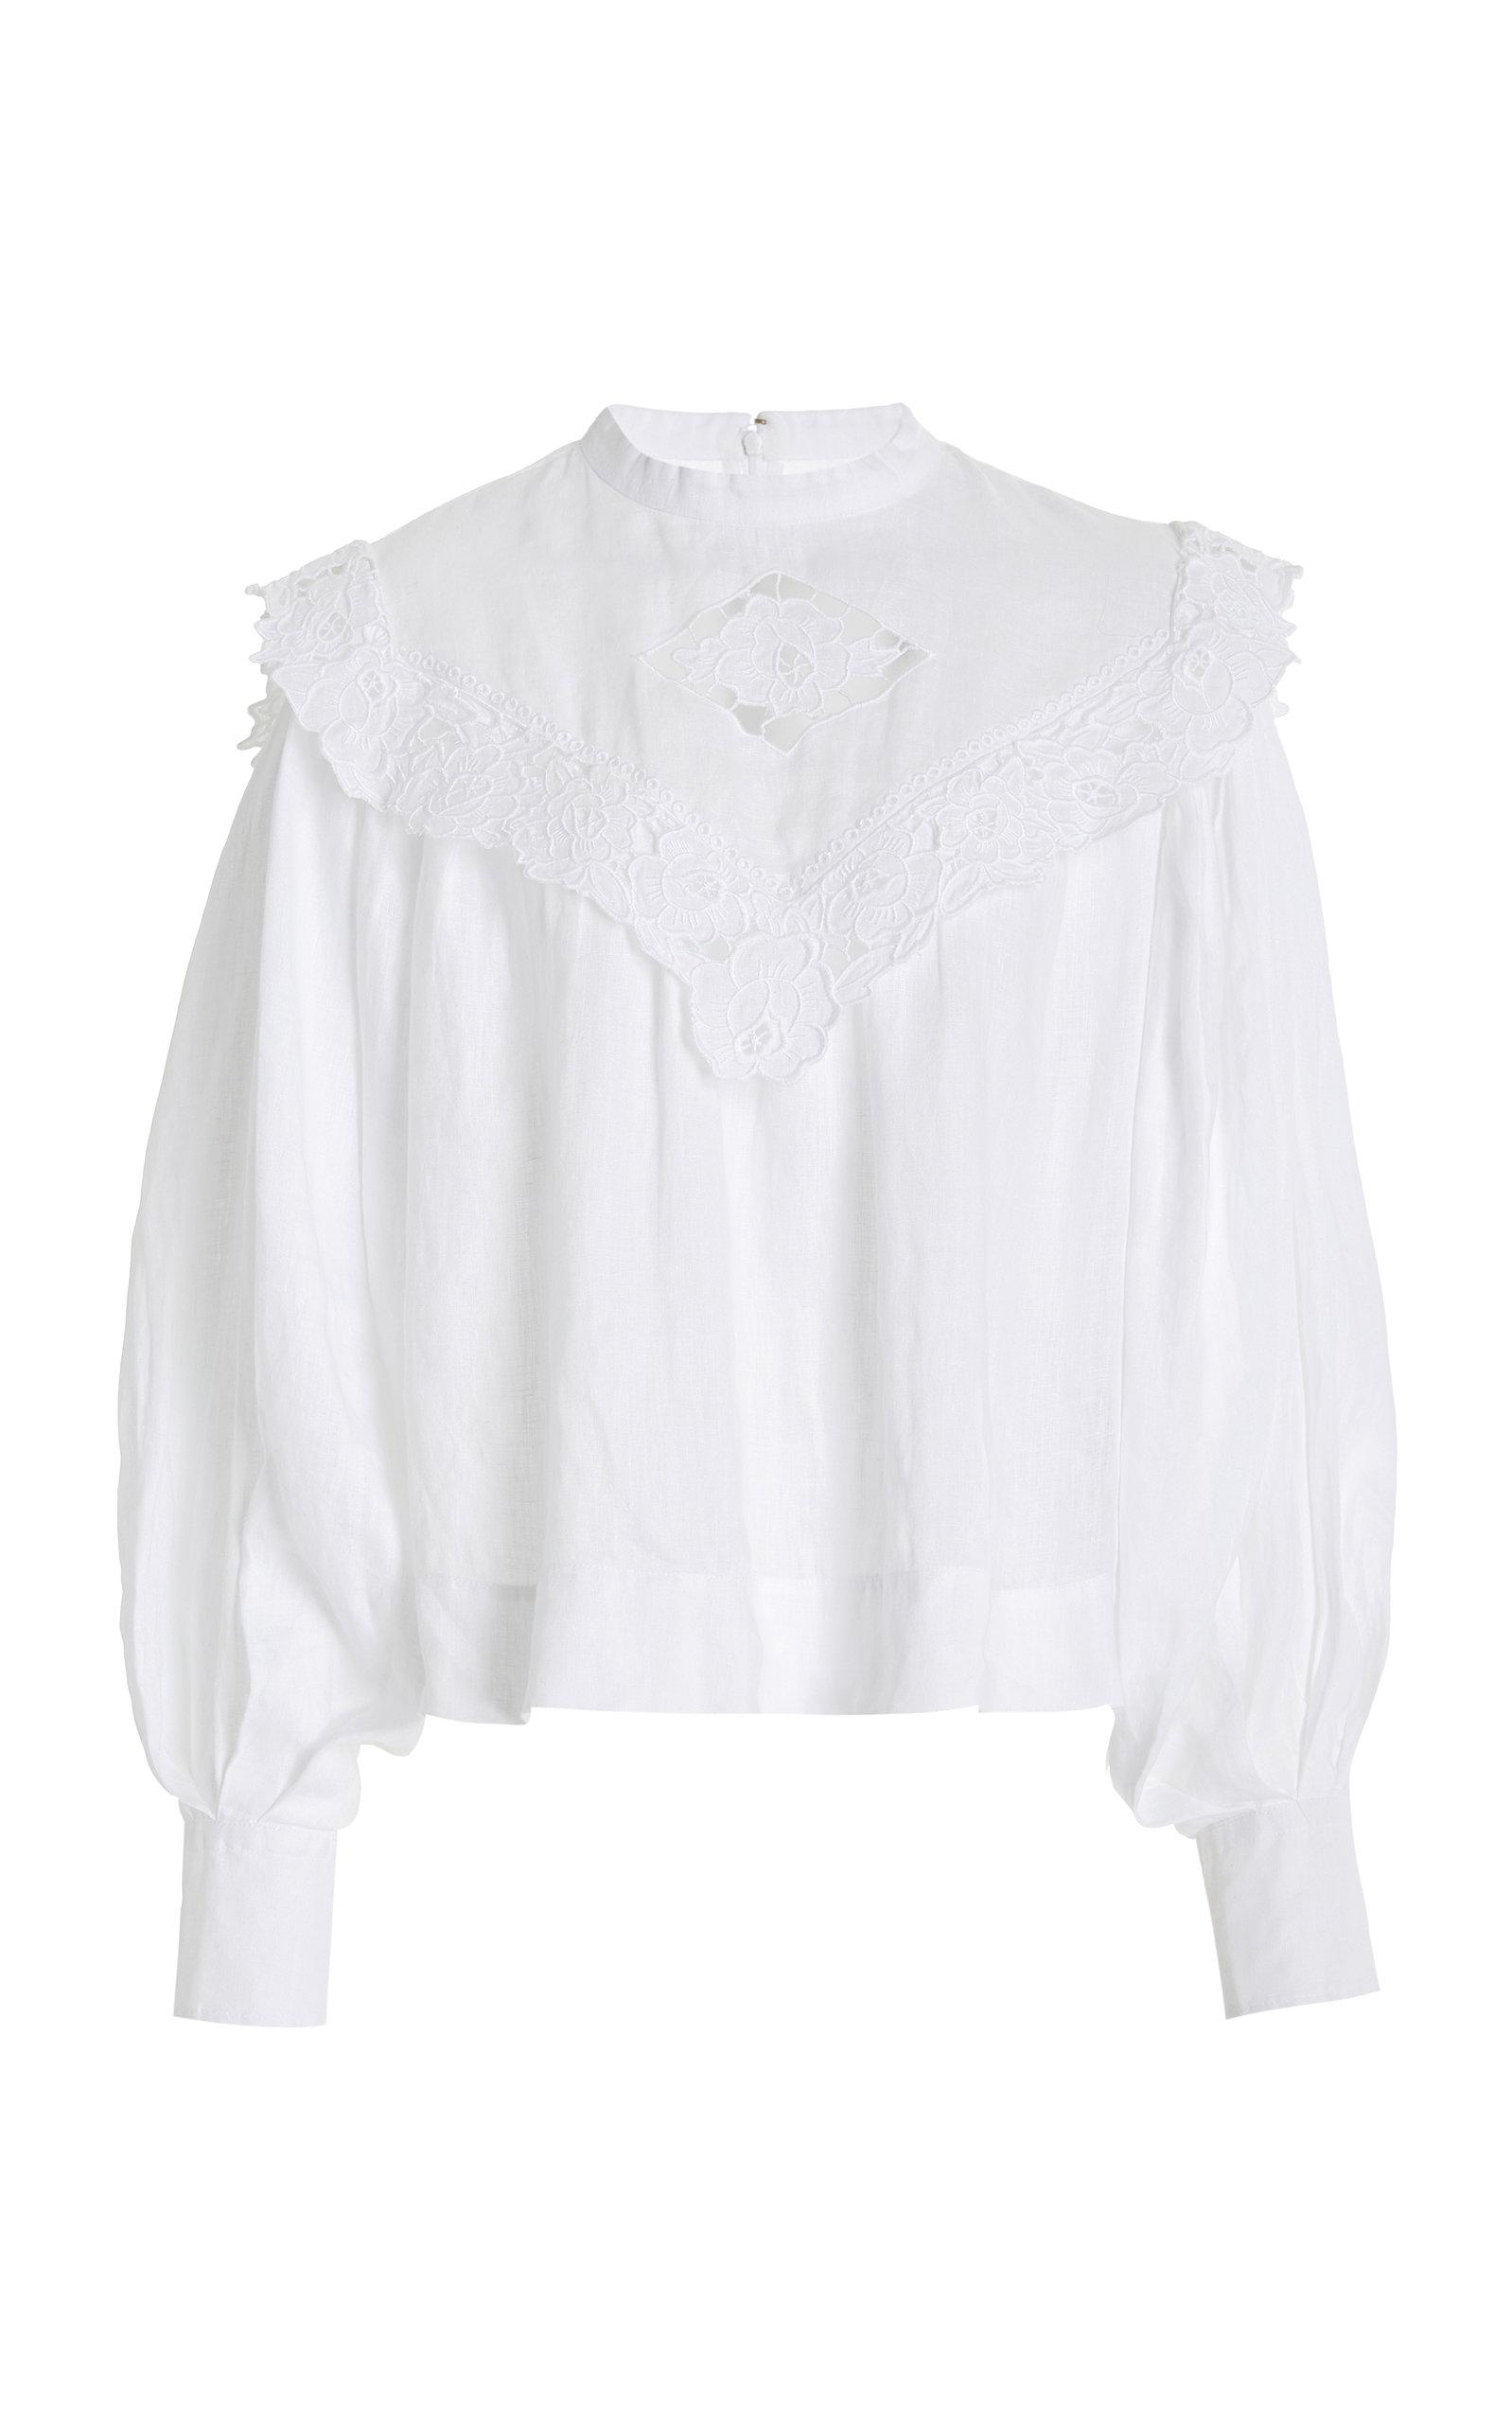 Women's Elija Lace-Trimmed Linen Top